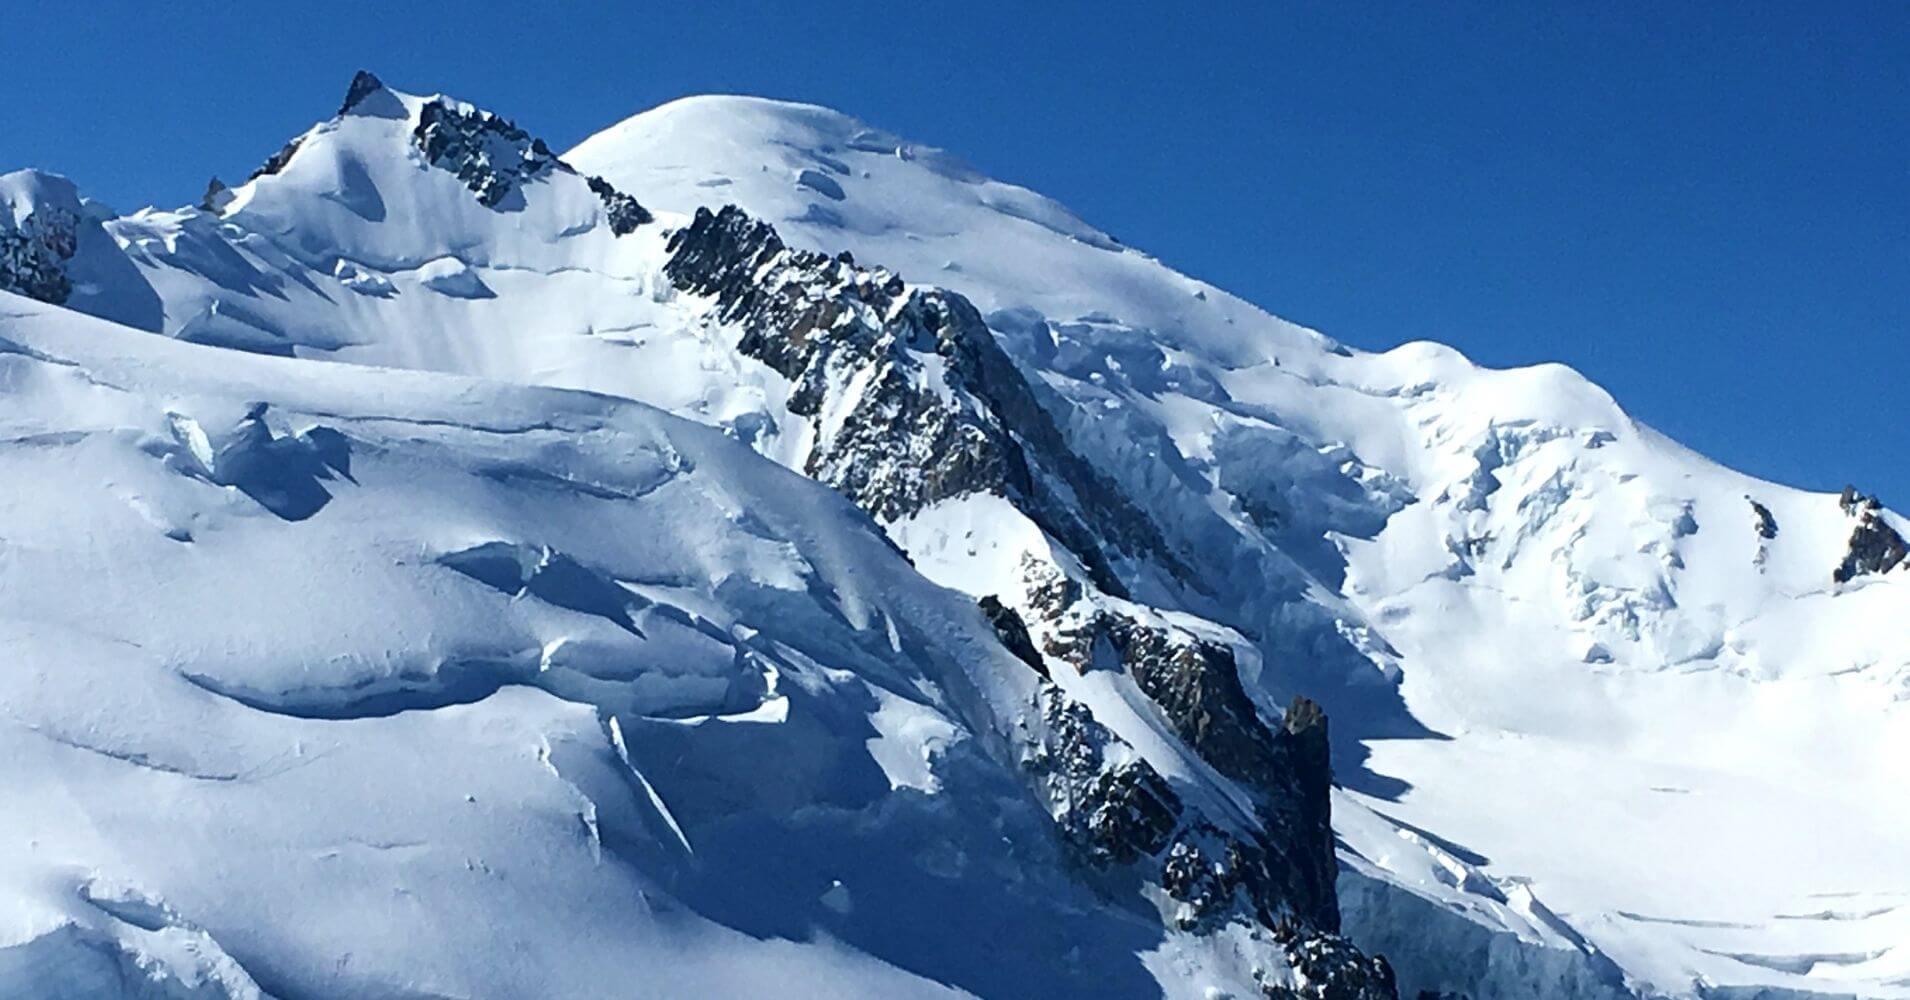 Cumbre del Mont Blanc, 4810m. Chamonix, Alta Saboya. Auvernia-Ródano-Alpes. Francia.